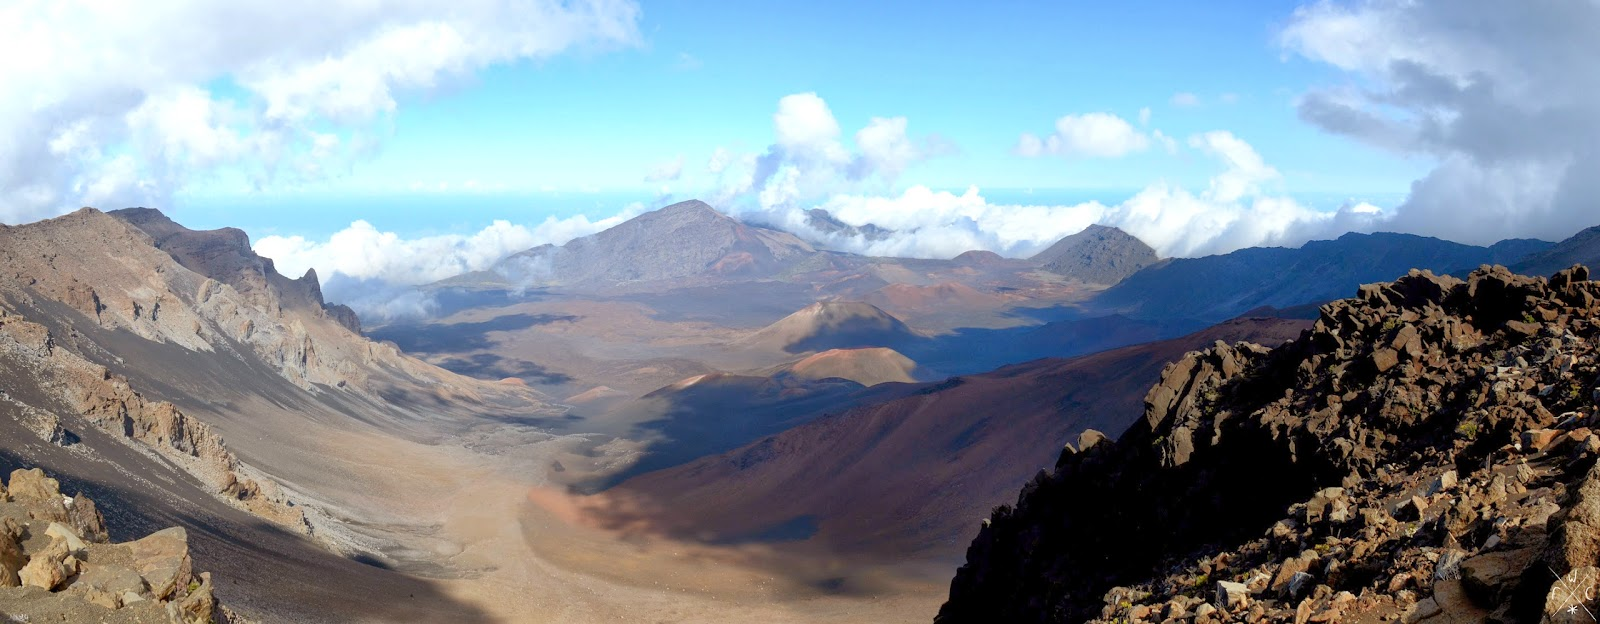 Haleakalā Crater - Haleakalā National Park - Maui, Hawaii